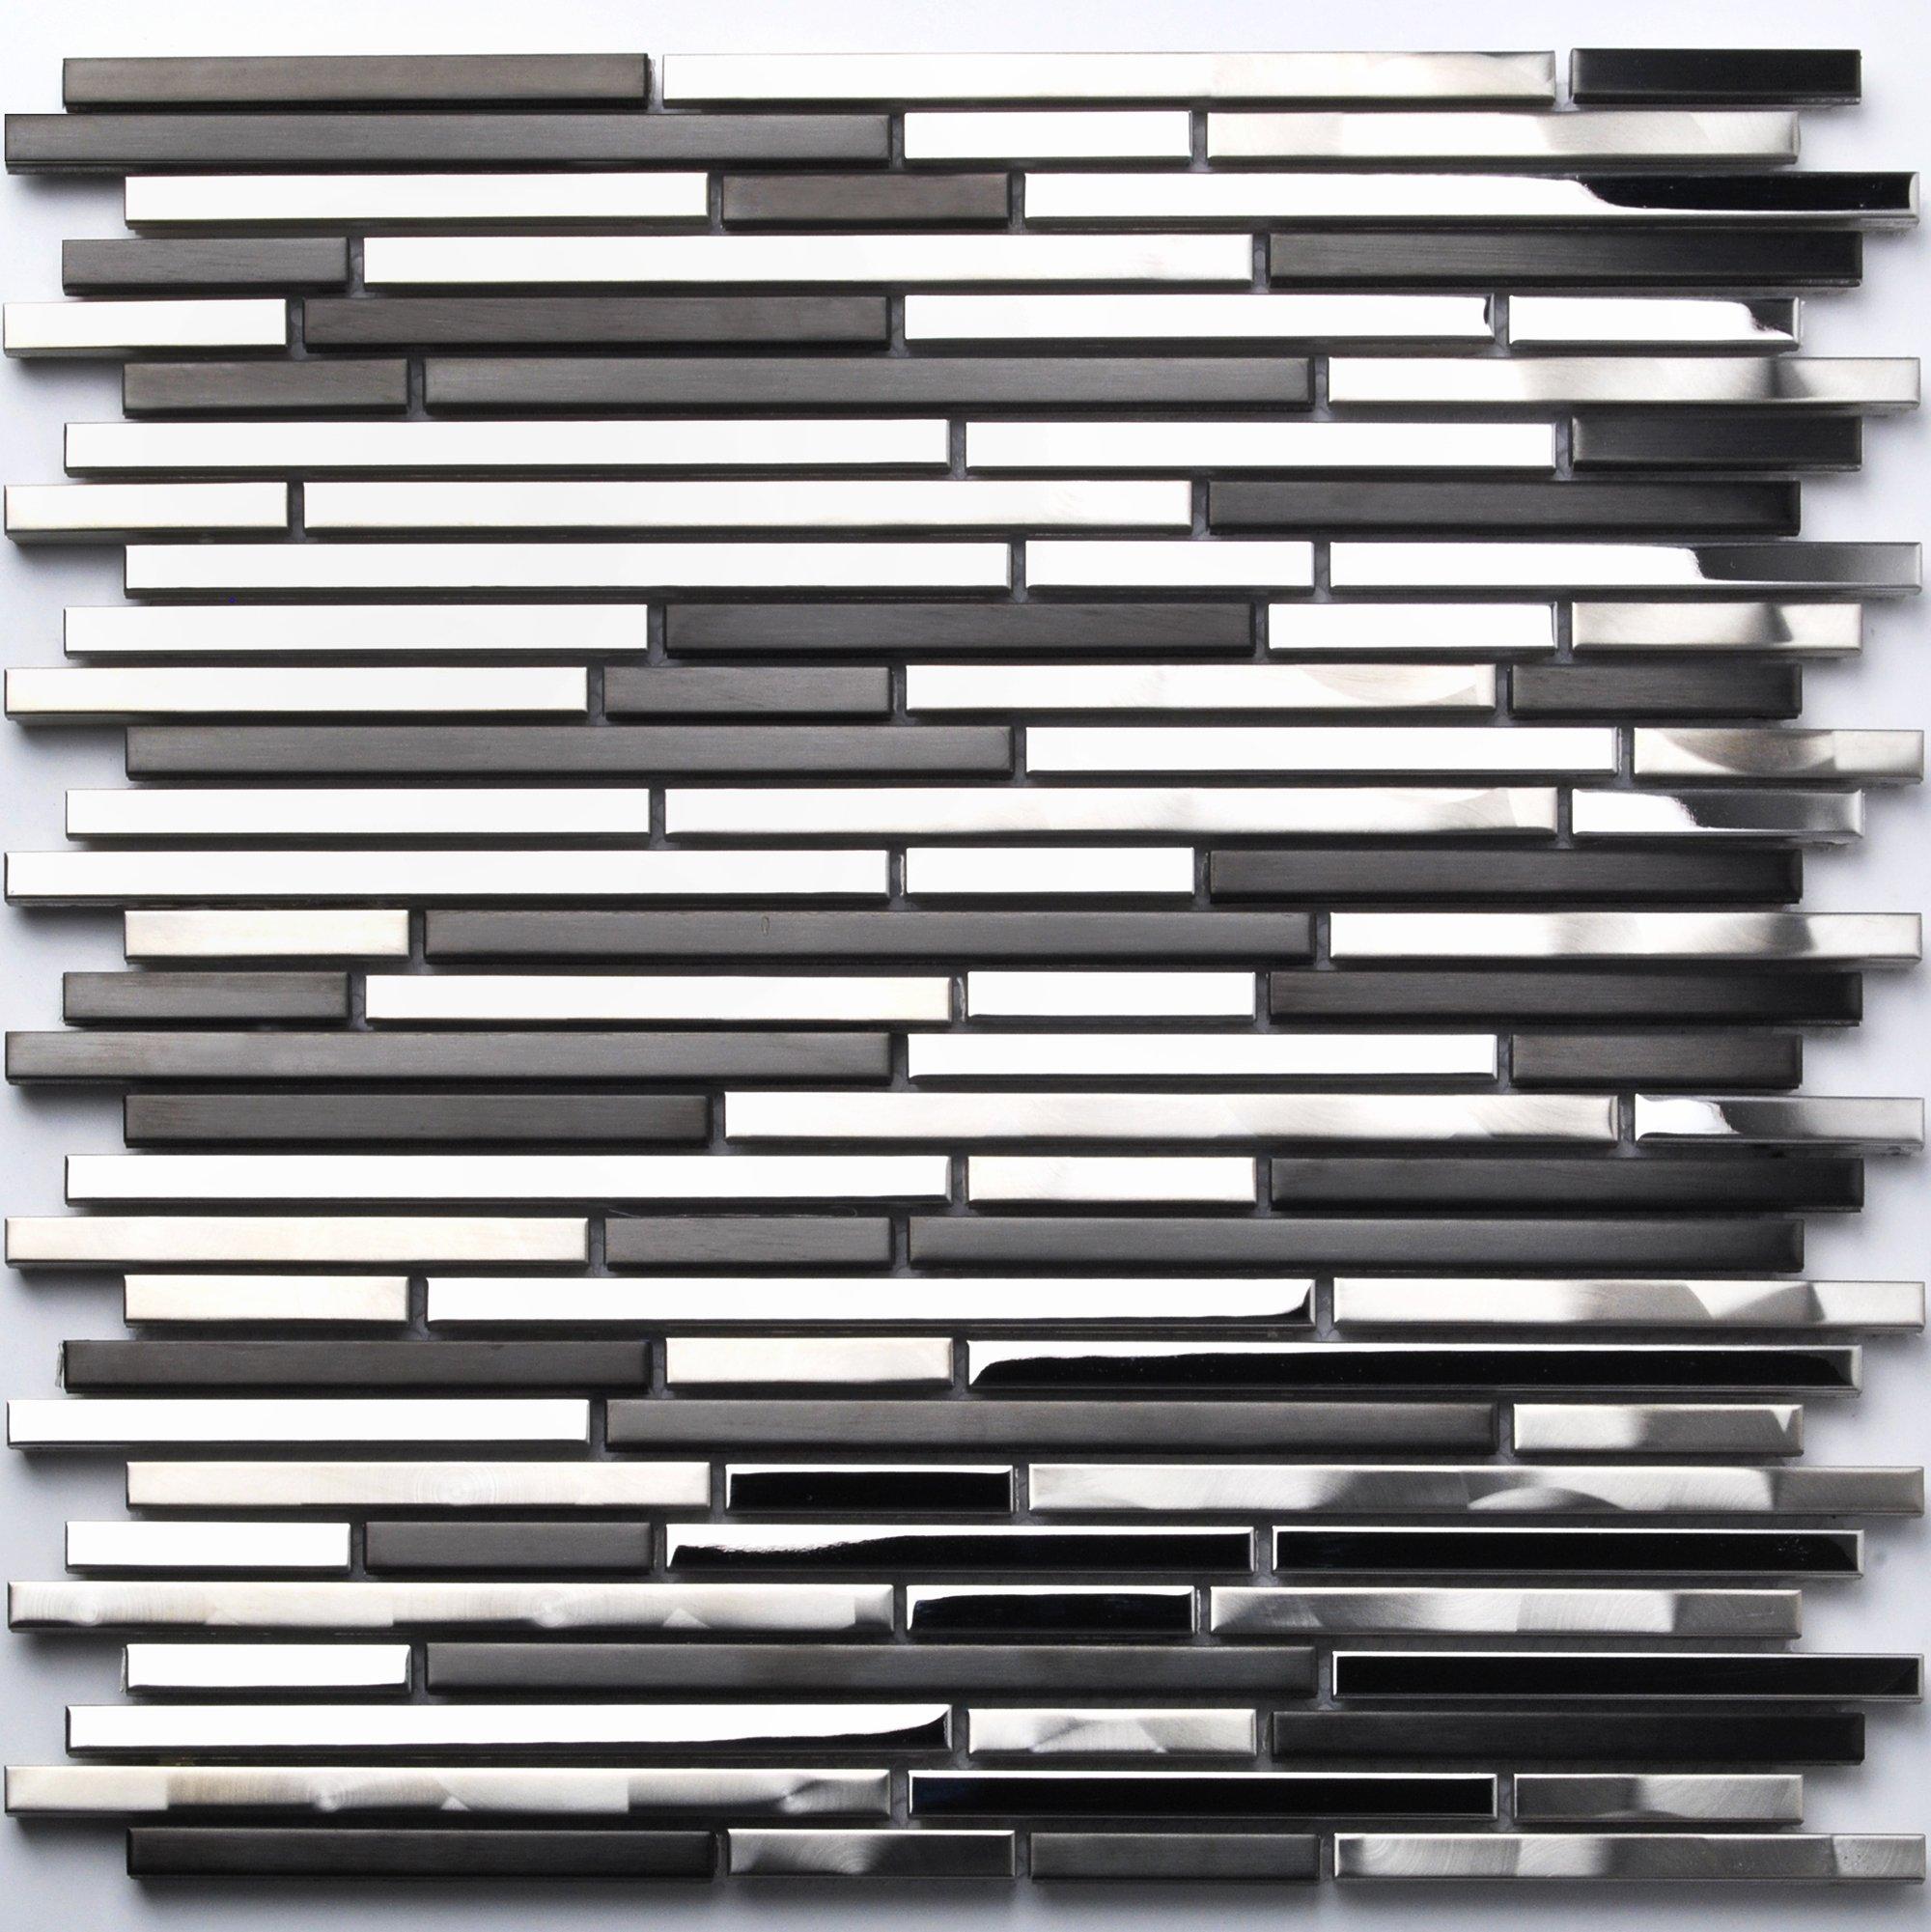 Stainless Steel Tile Interlocking Black Silver CD Marks Kitchen Backsplash Decor Strip Metal Tile TSTMBT018 (11 PCS [12'' X 12''/each])